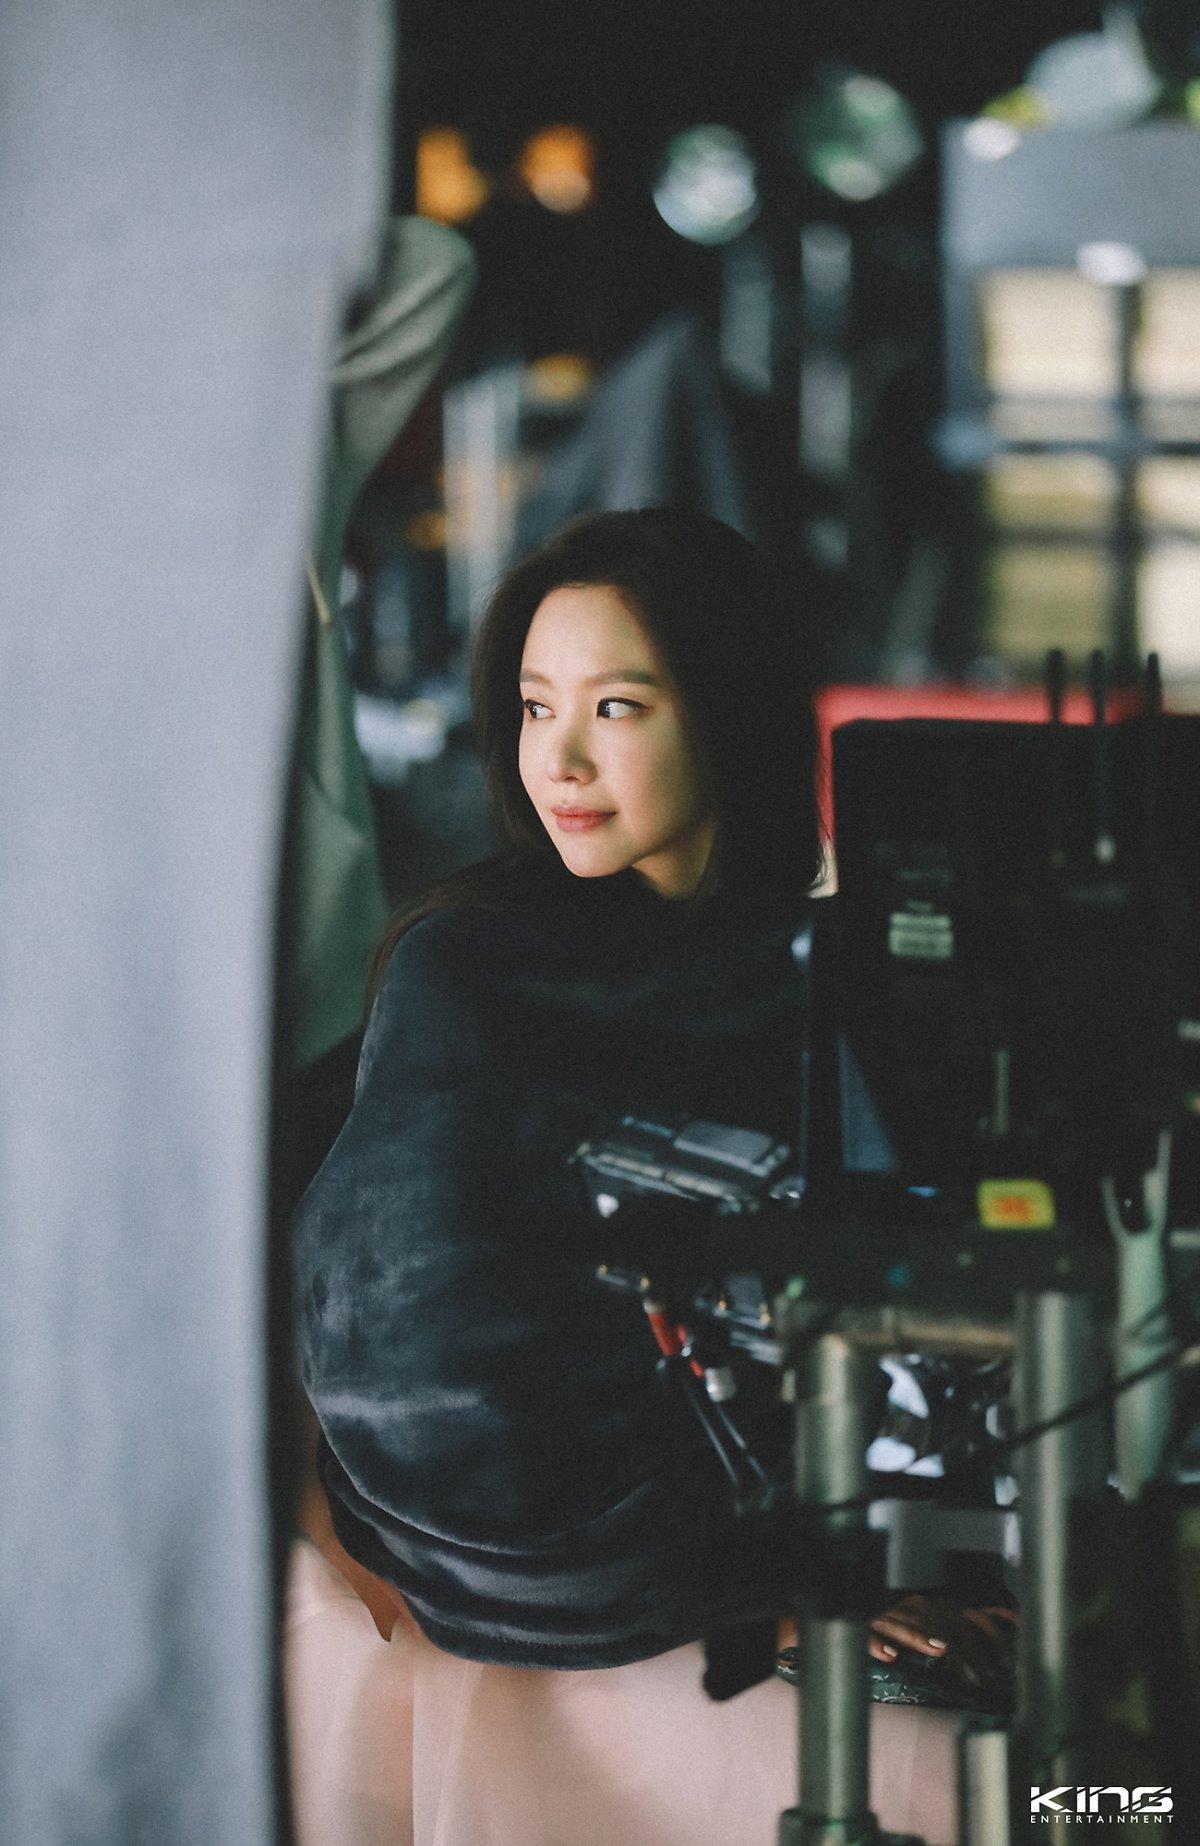 Jung Hae In Archive in 2021   Jung hae in, Hae in, Jung hae